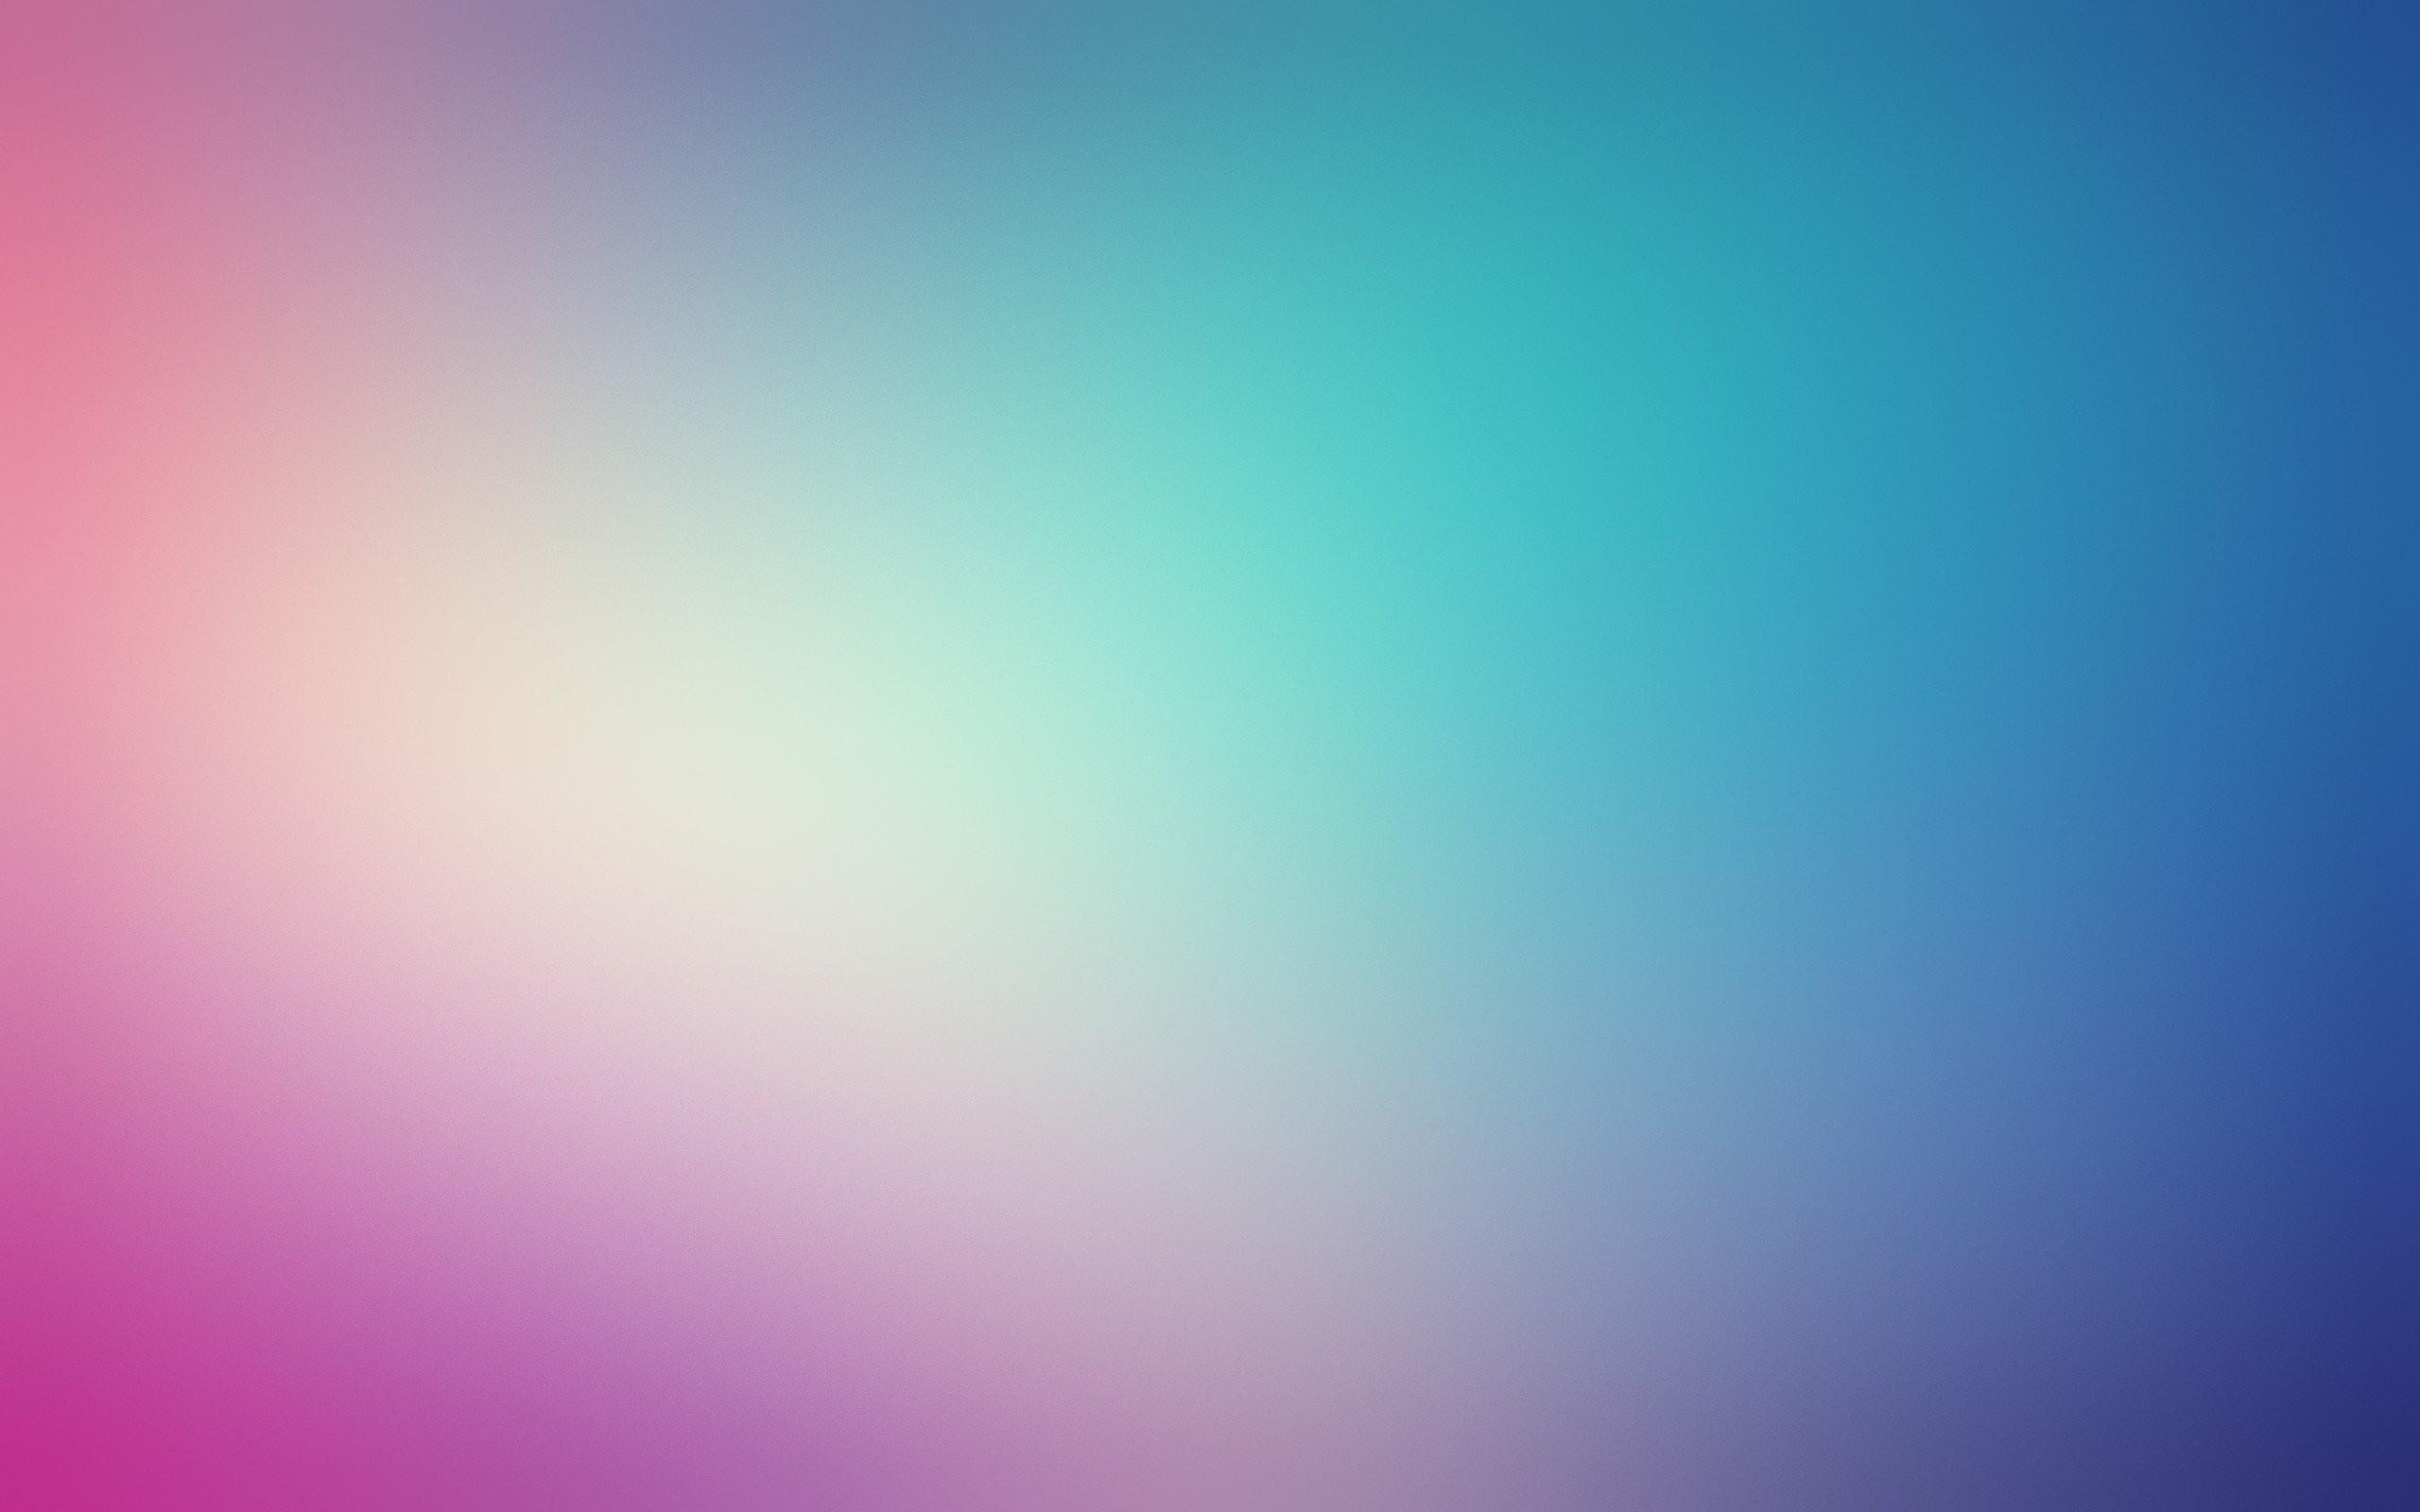 Pastel Colors Background 54 Images